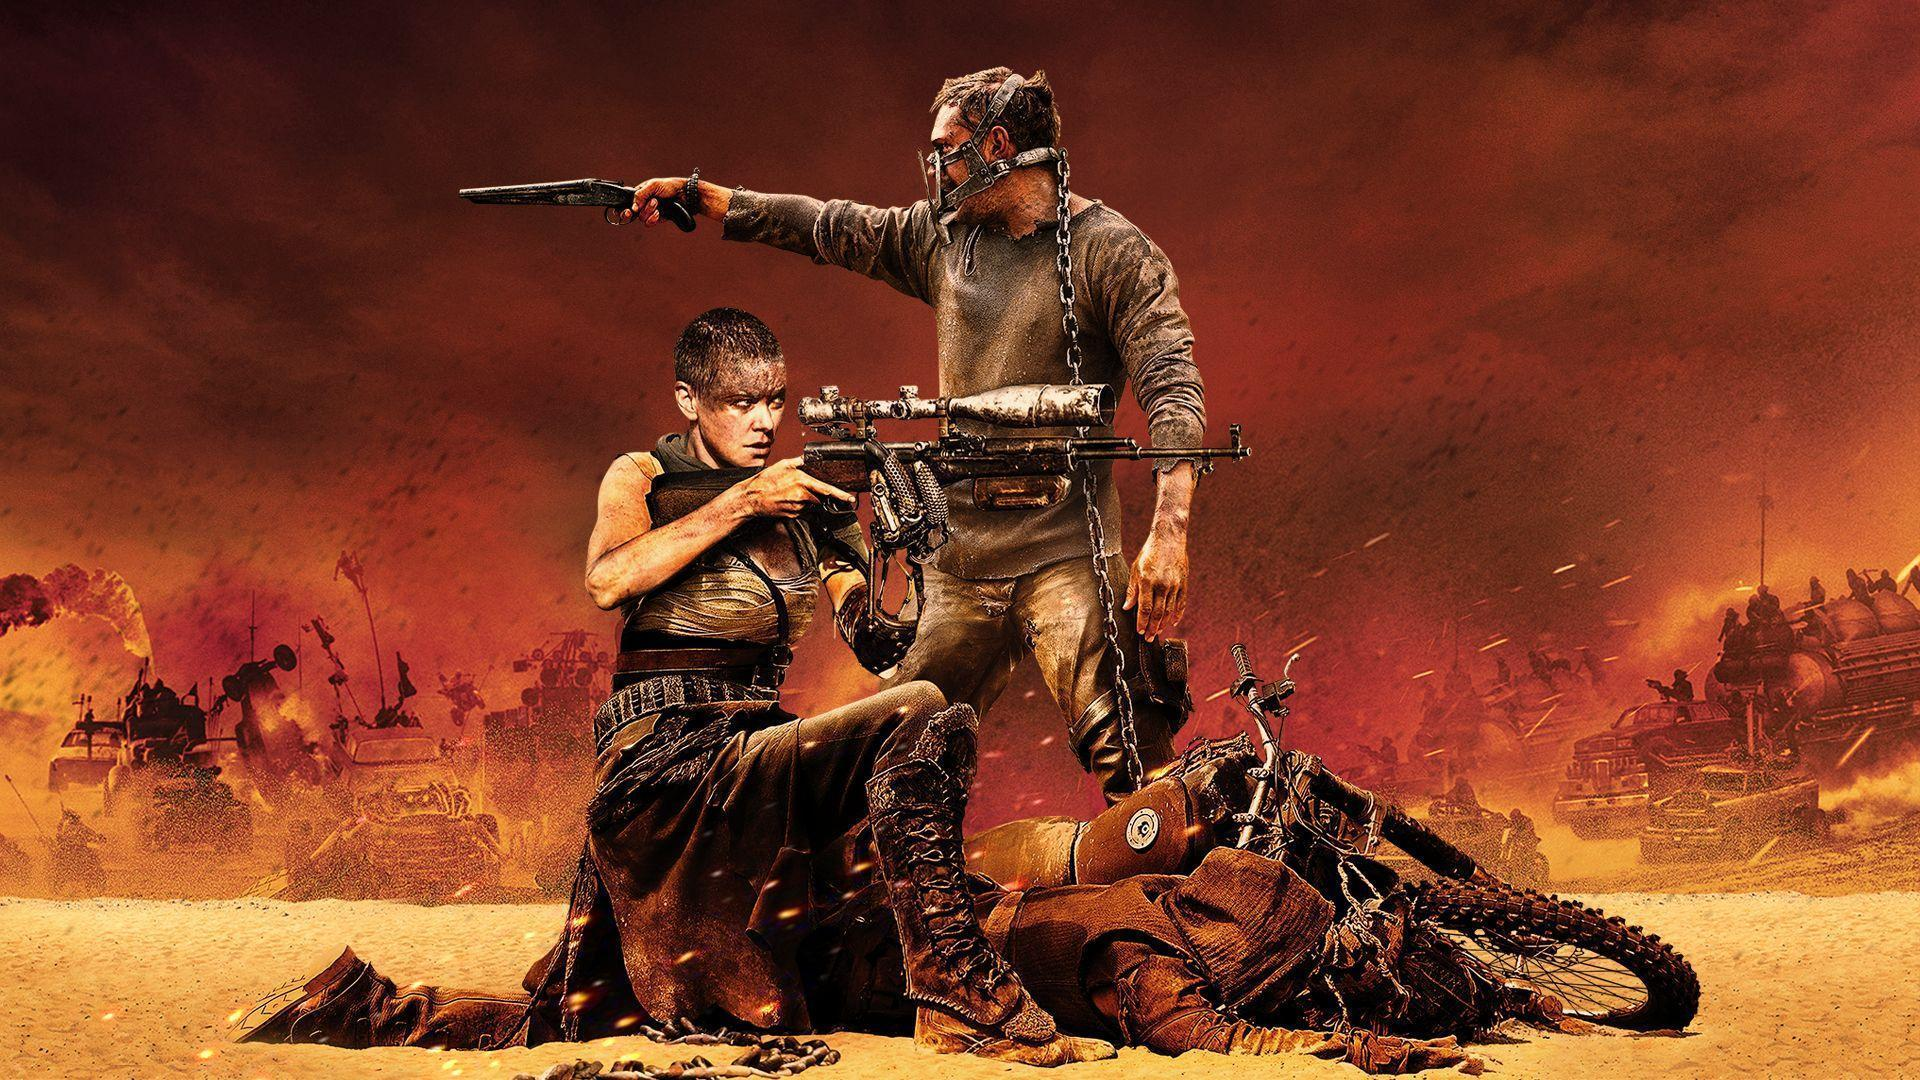 Mad Max Fury Road Wallpaper 1920x1080 by sachso74.deviantart.com .